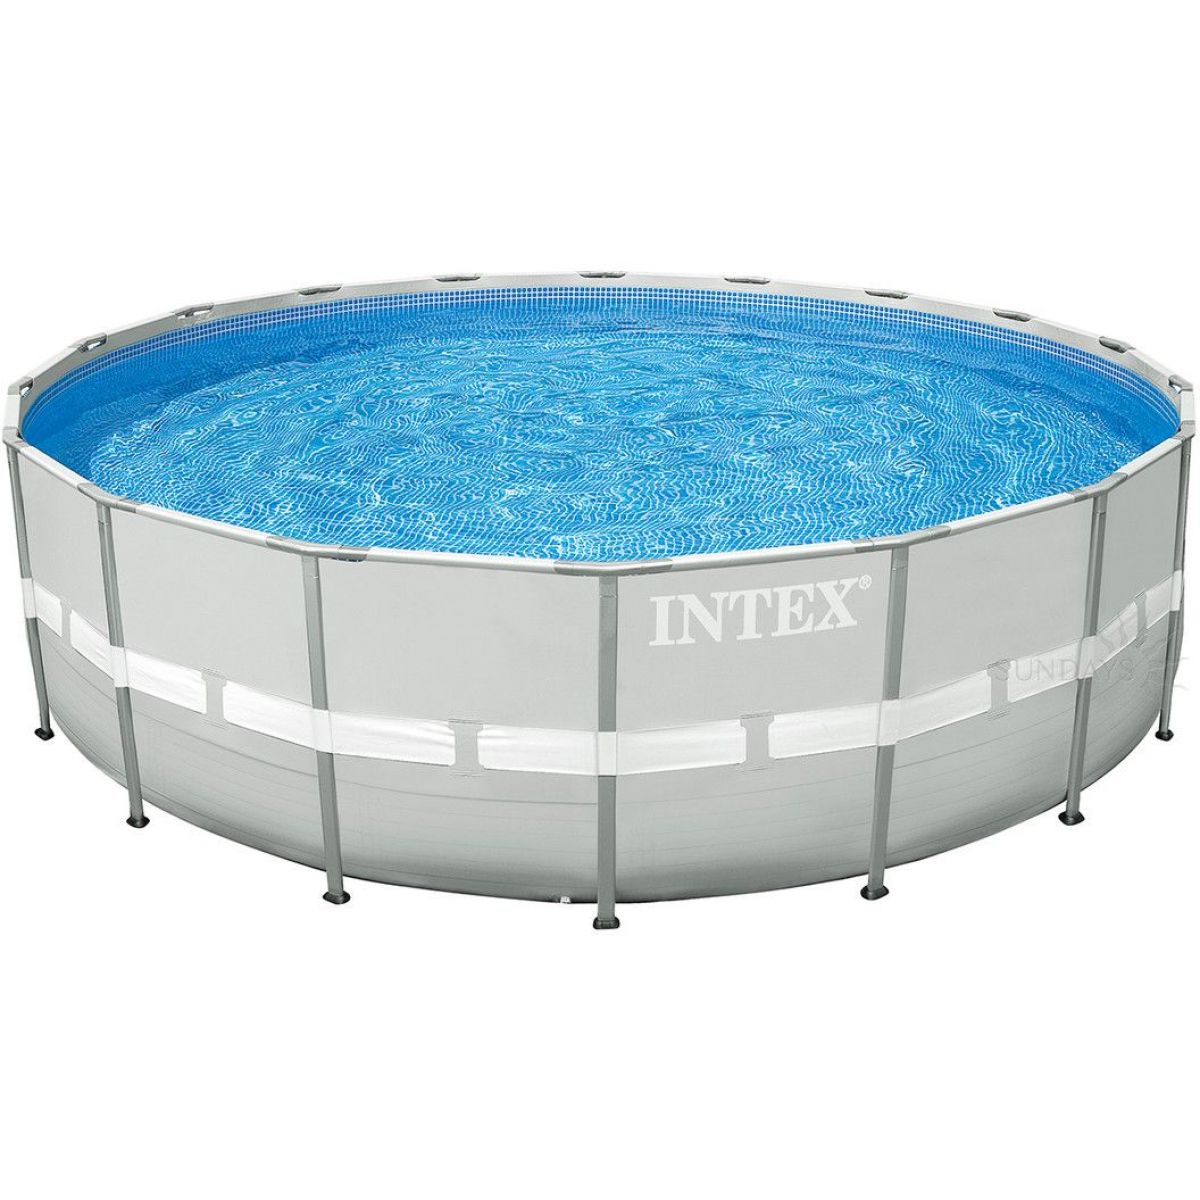 Intex 28322 Bazén s tvrzeným rámem 488x122cm